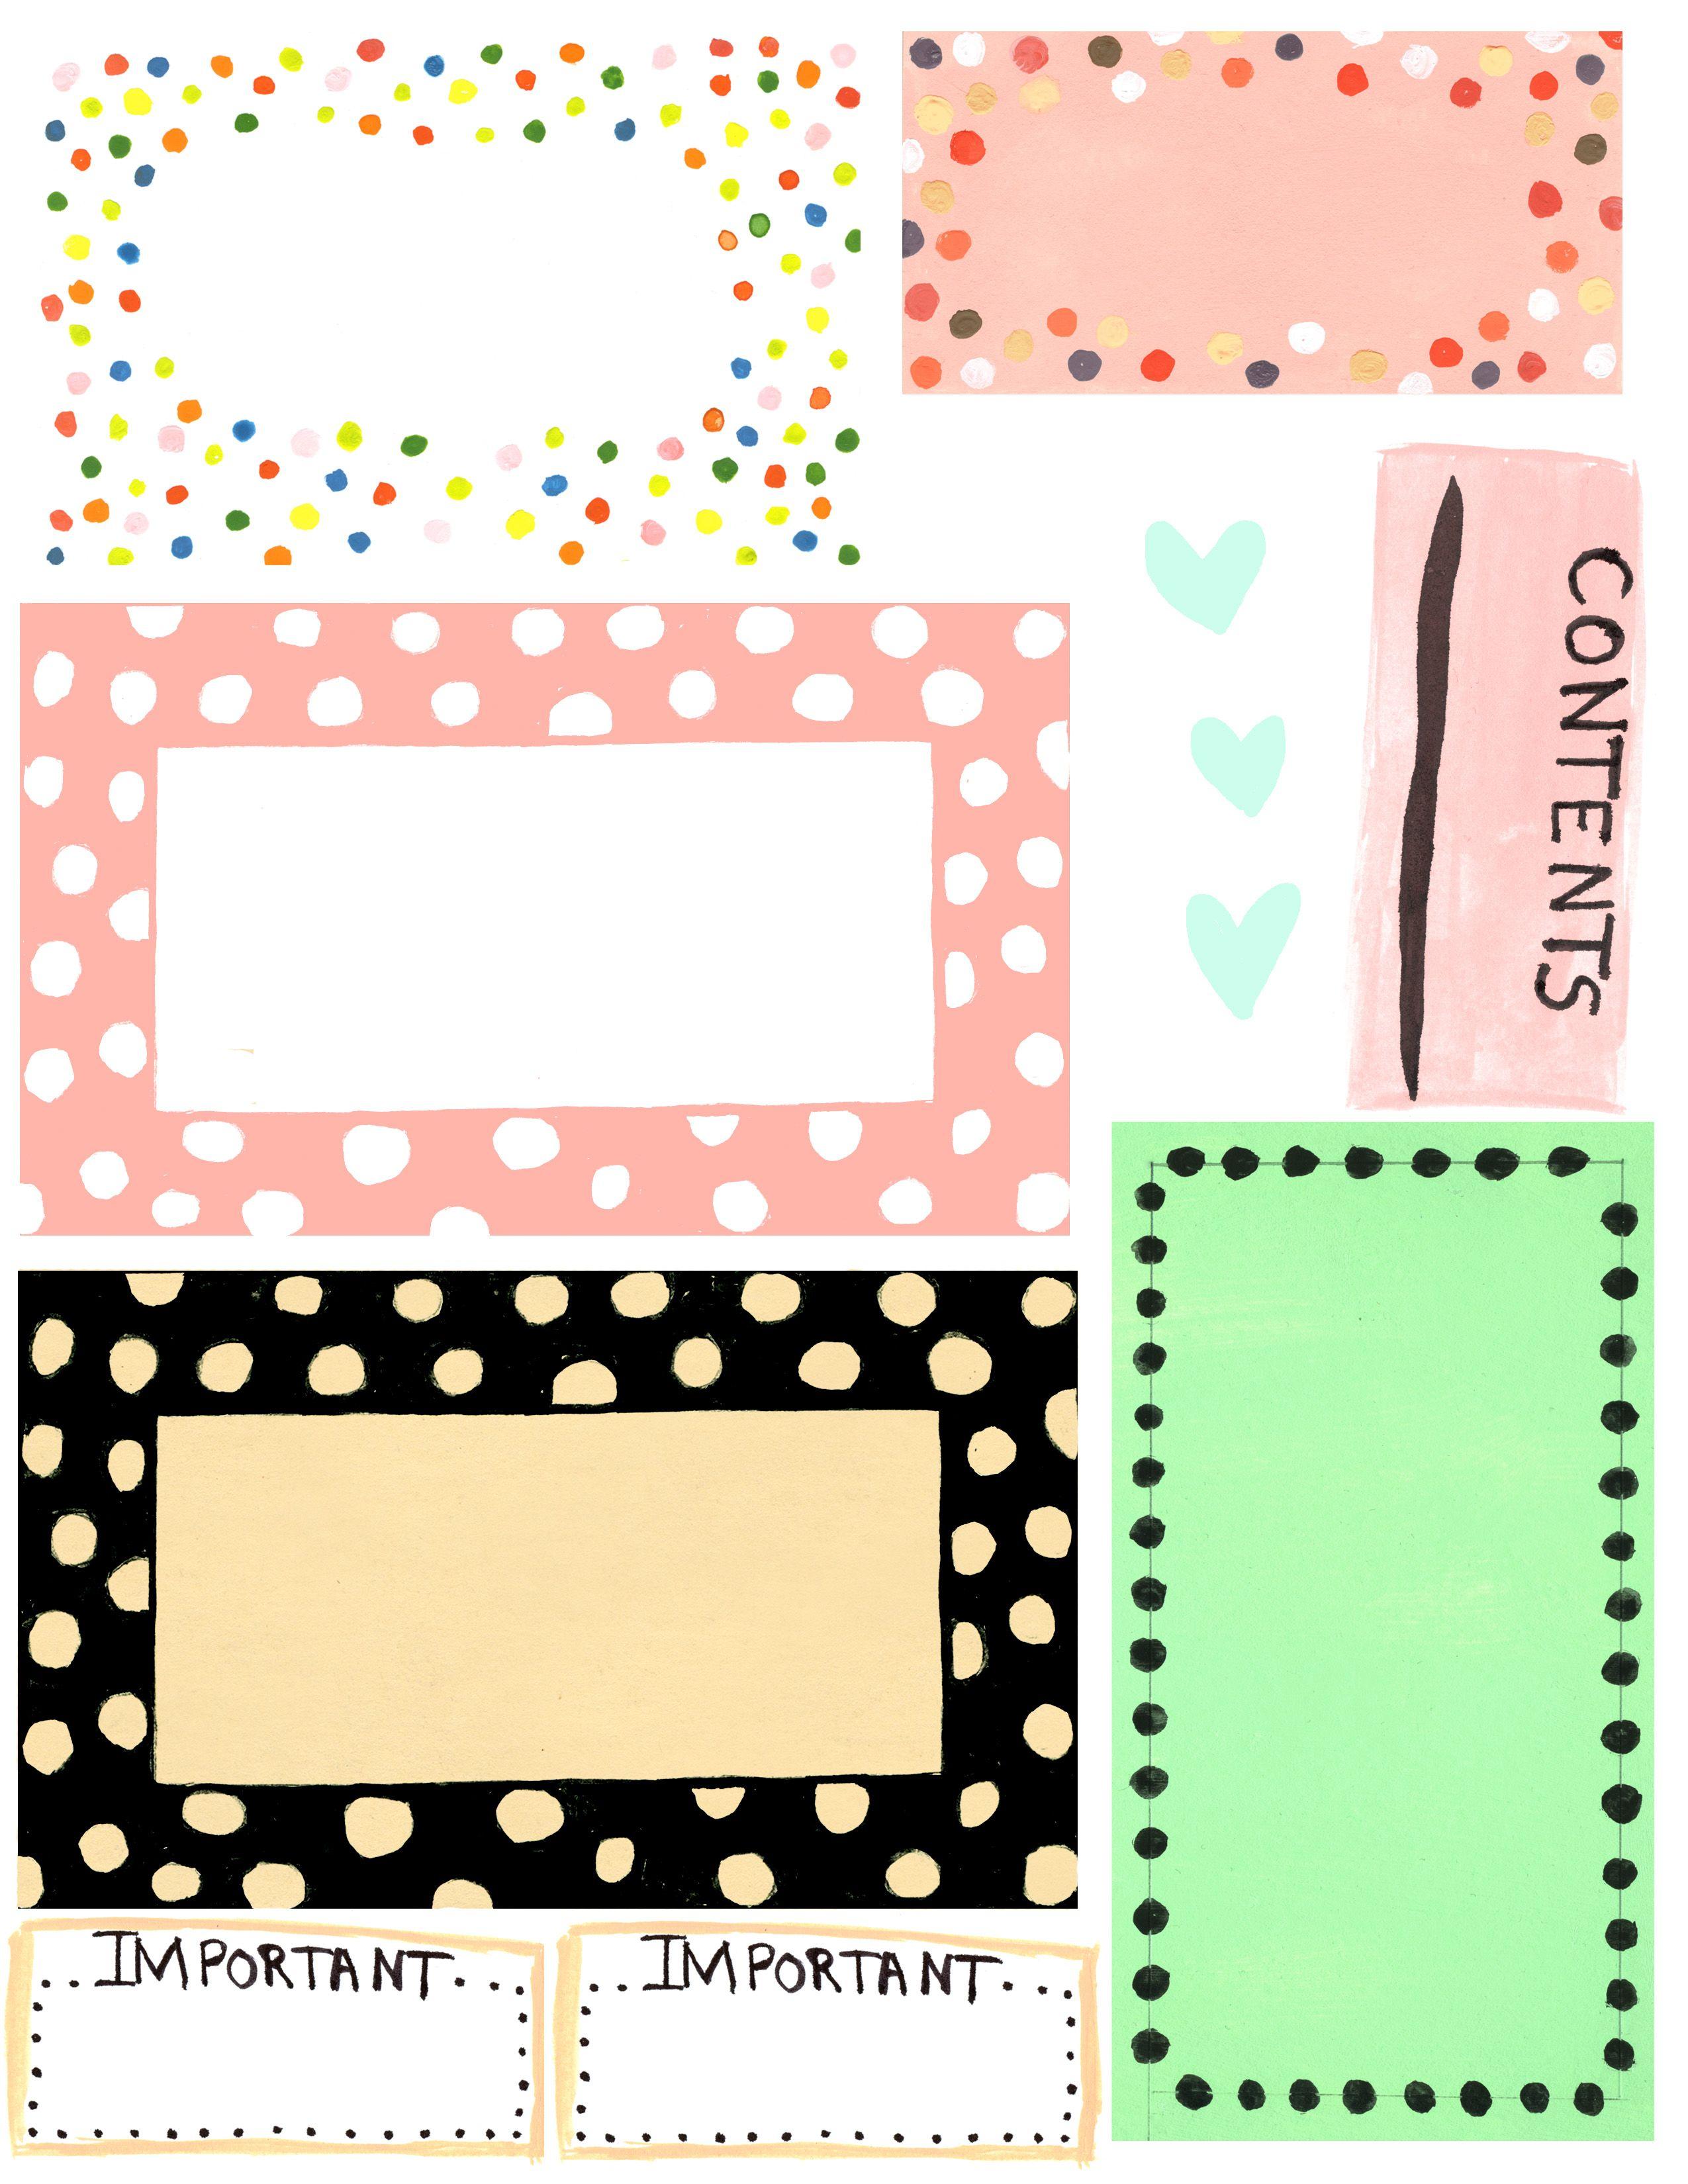 Free Printable Label Design Template Cakepins   Free Printables - Free Editable Printable Labels